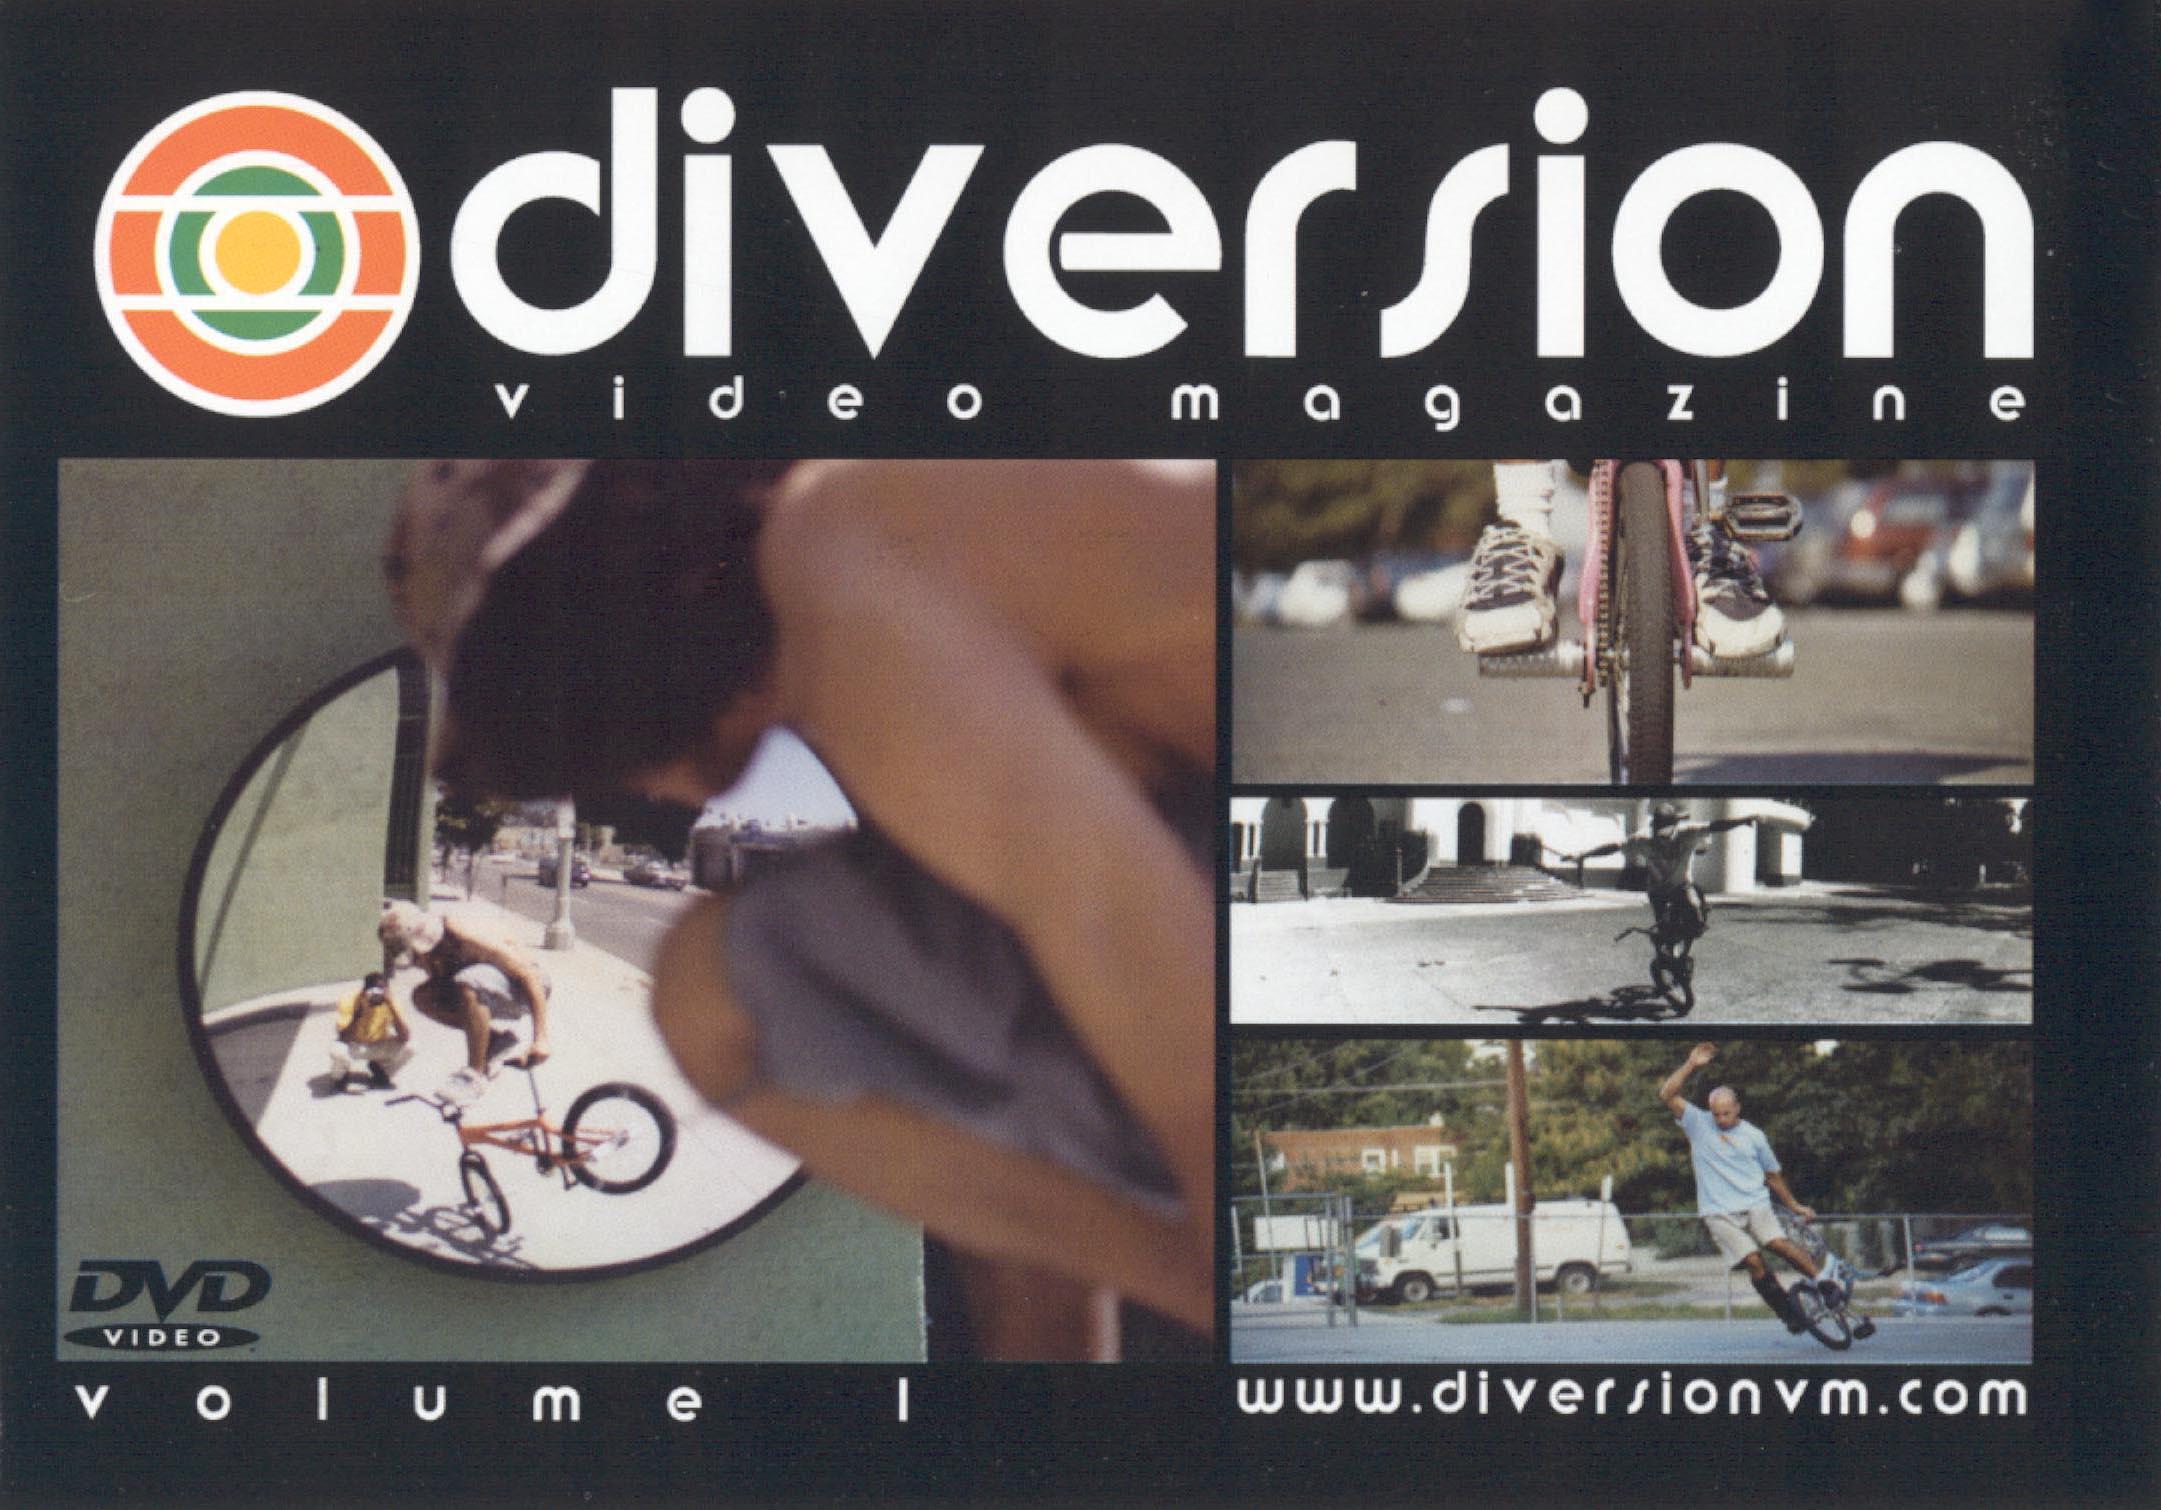 Diversion Video Magazine, Vol. 1